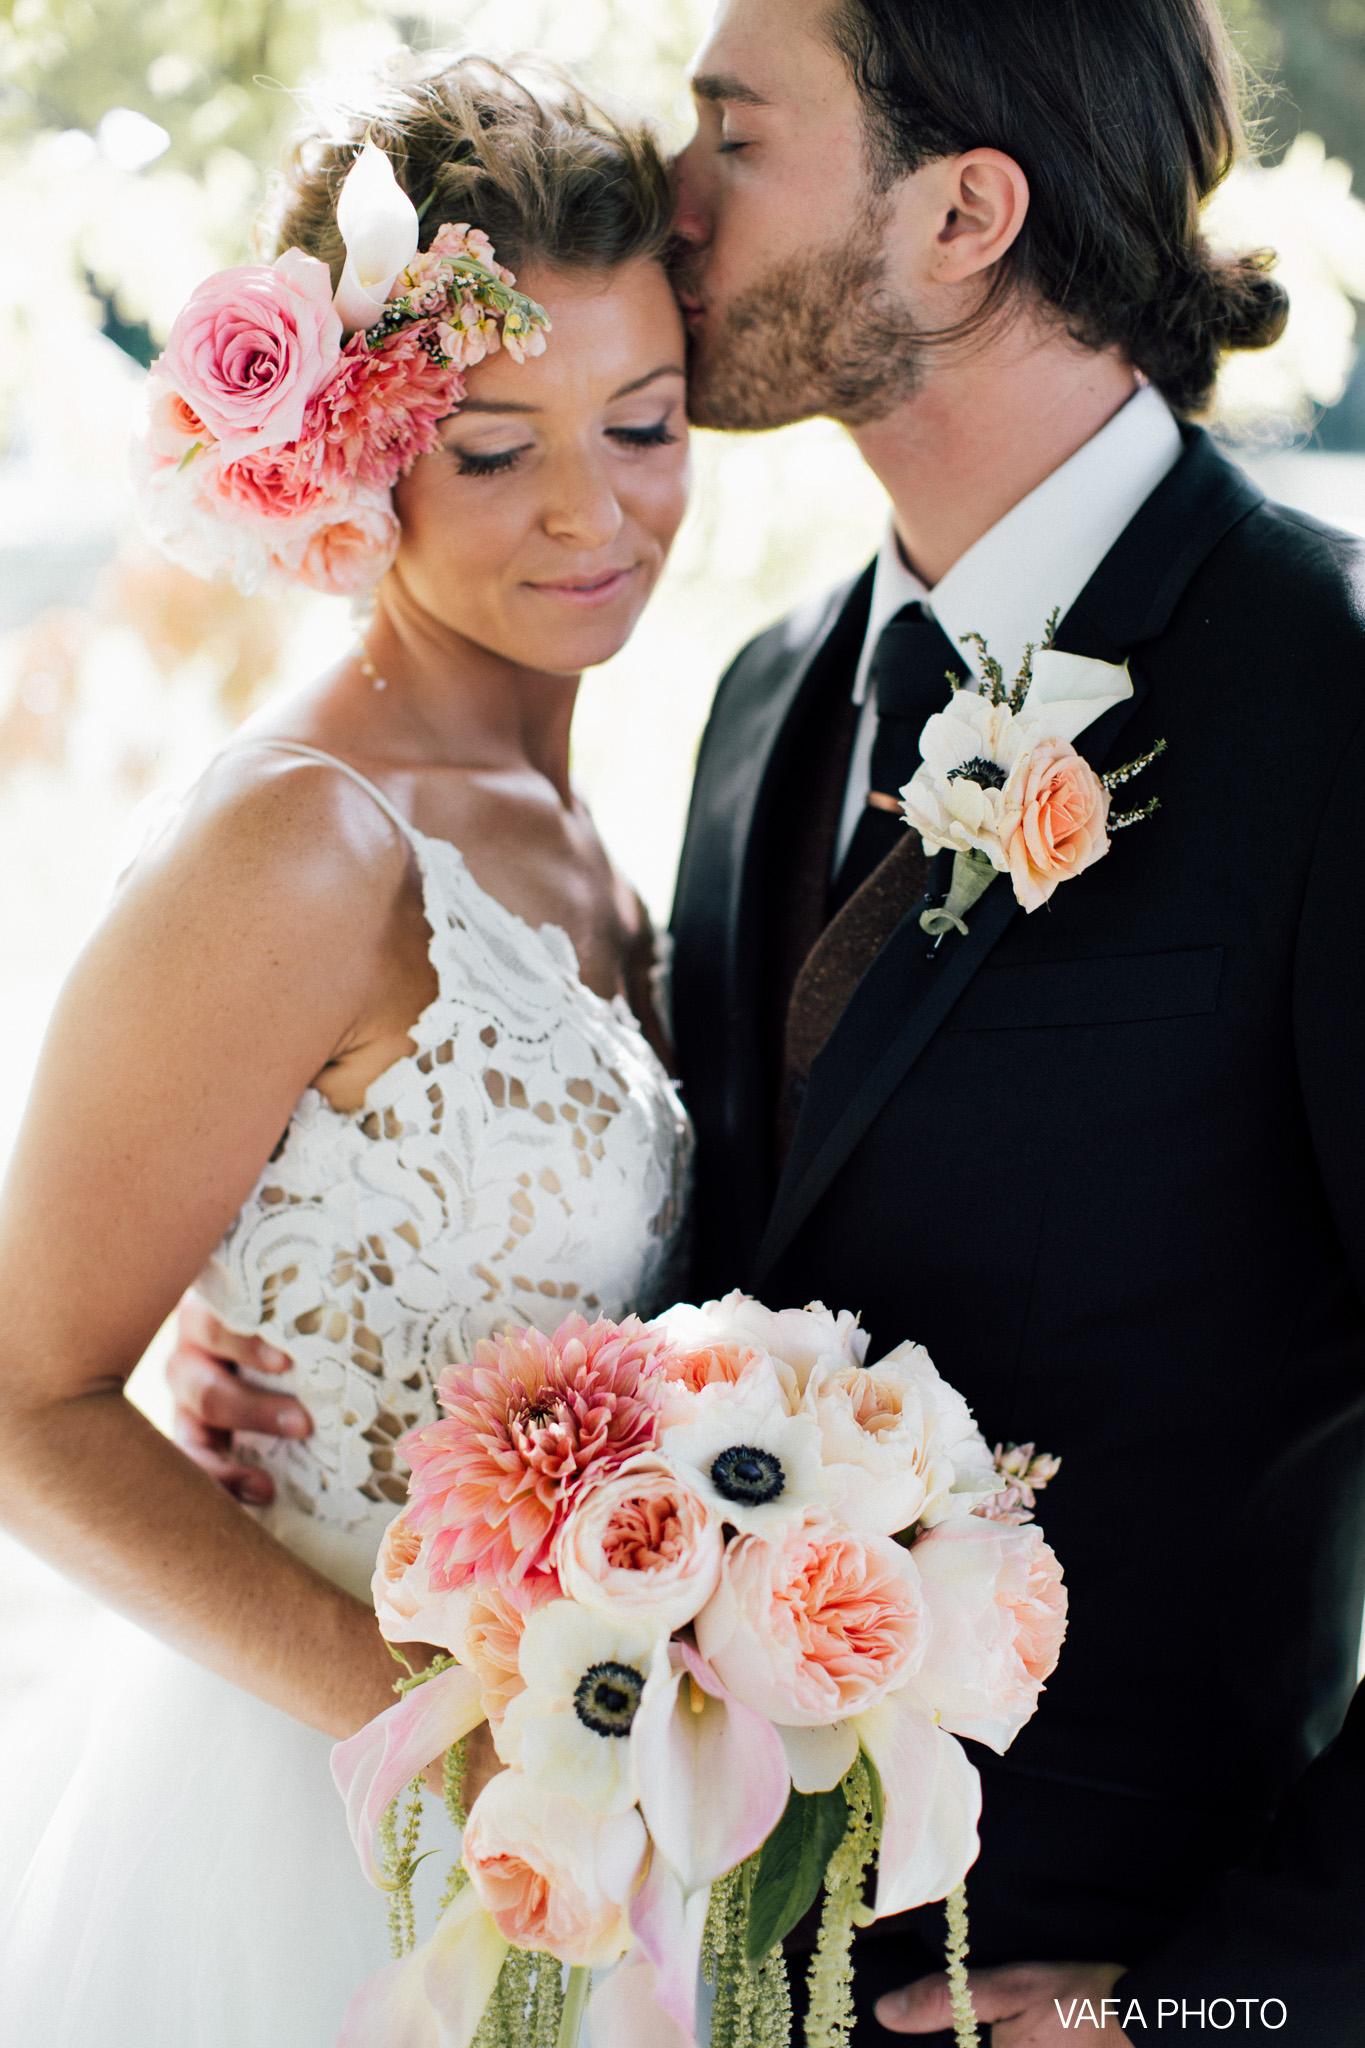 The-Felt-Estate-Wedding-Kailie-David-Vafa-Photo-582.jpg